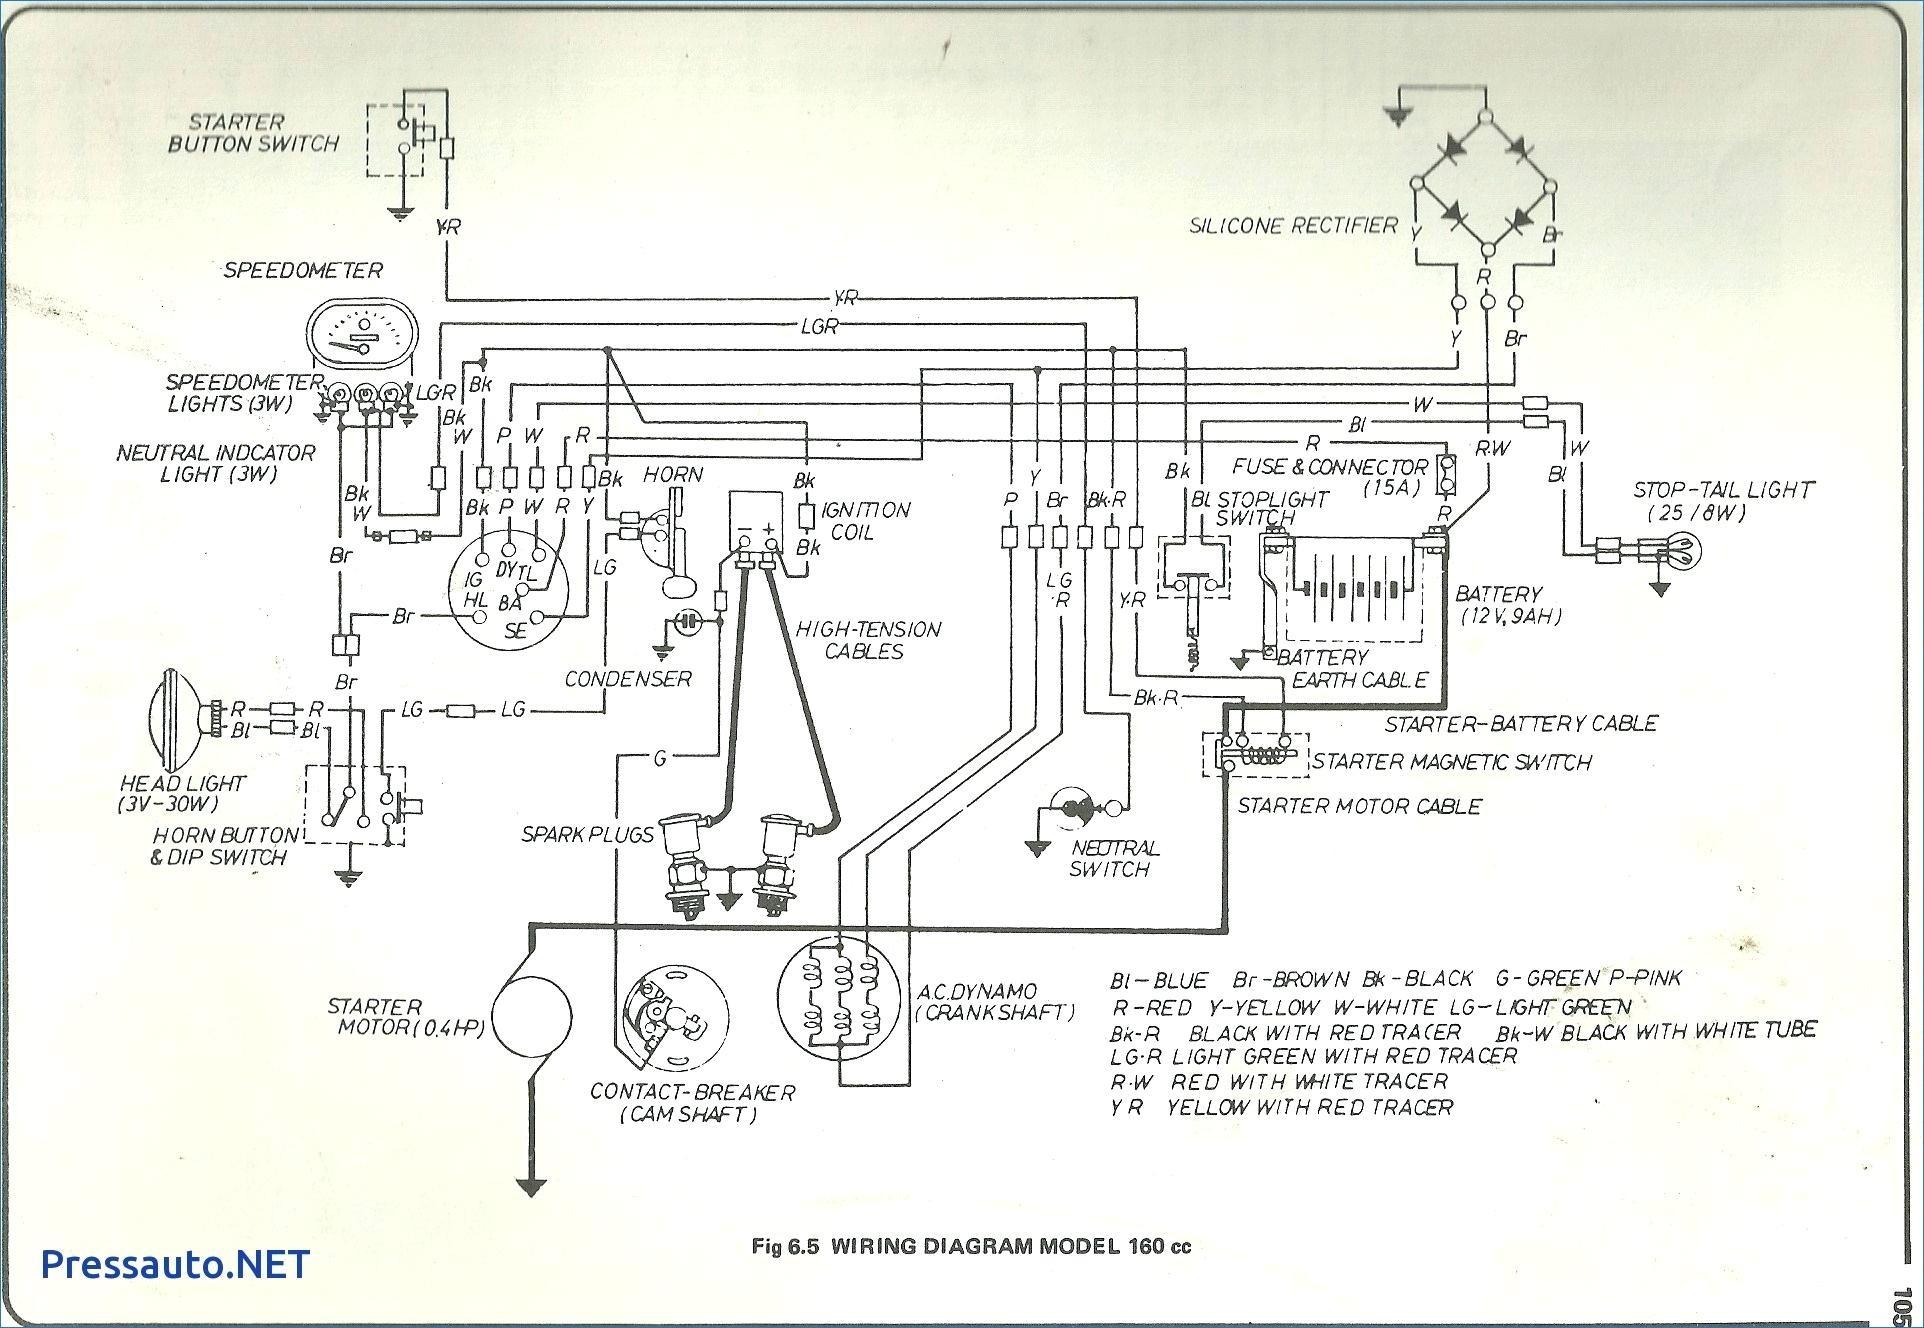 Amana Dryer Plug Wiring Diagram Prong Image Com 1924x1328